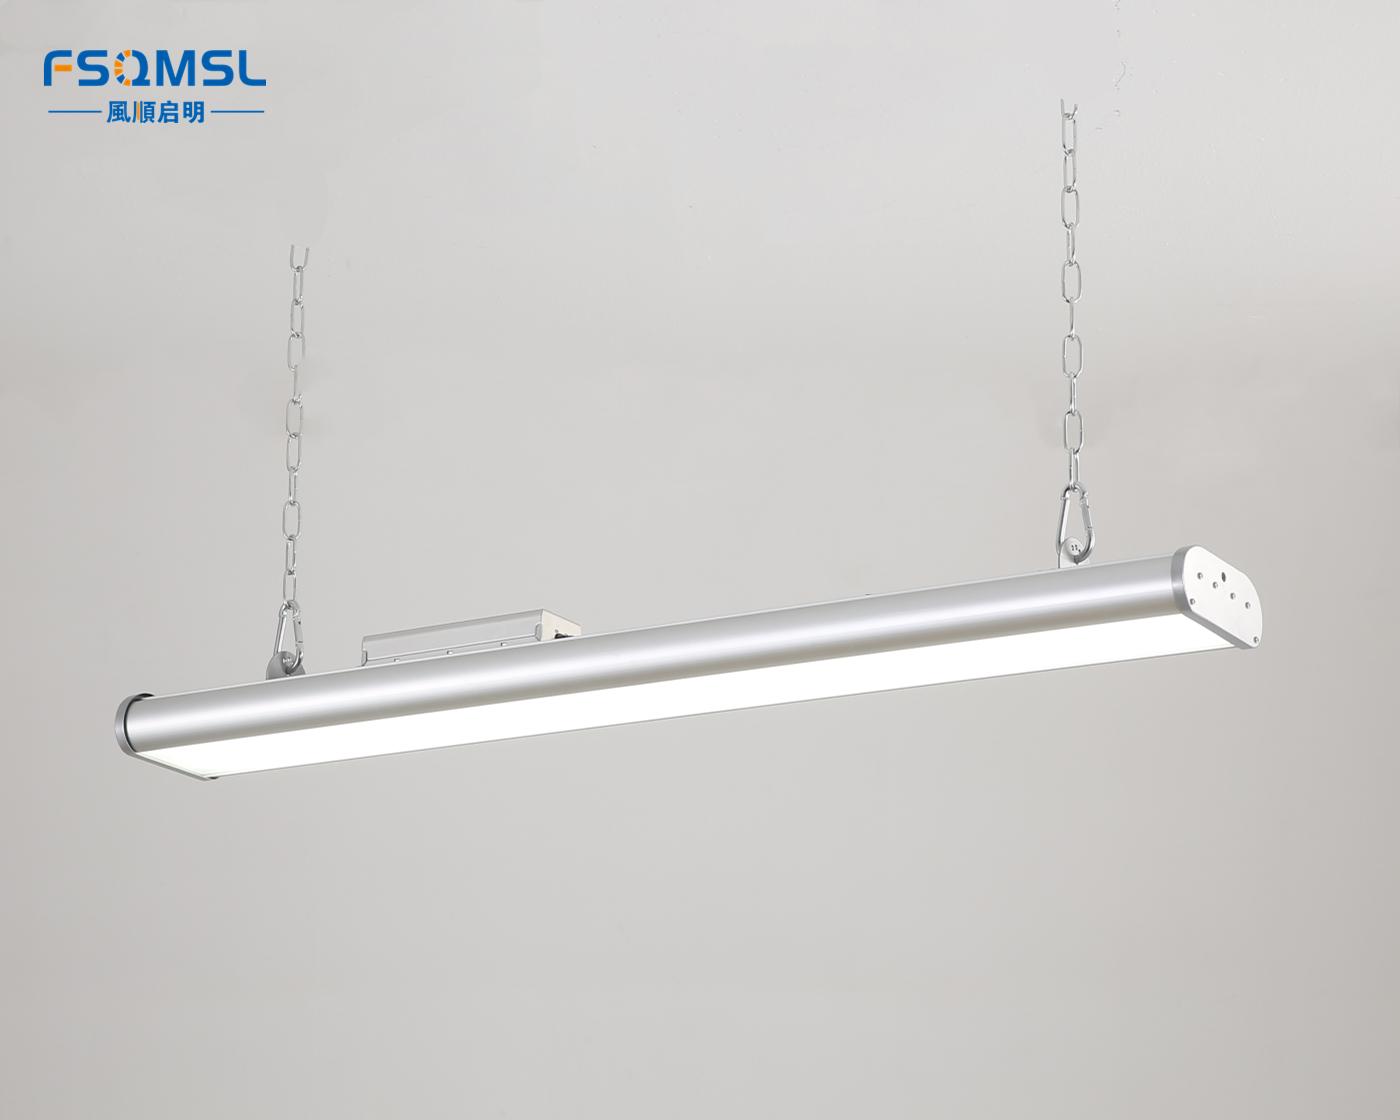 条形LED球馆灯 FS-TP0828 (100-240w)